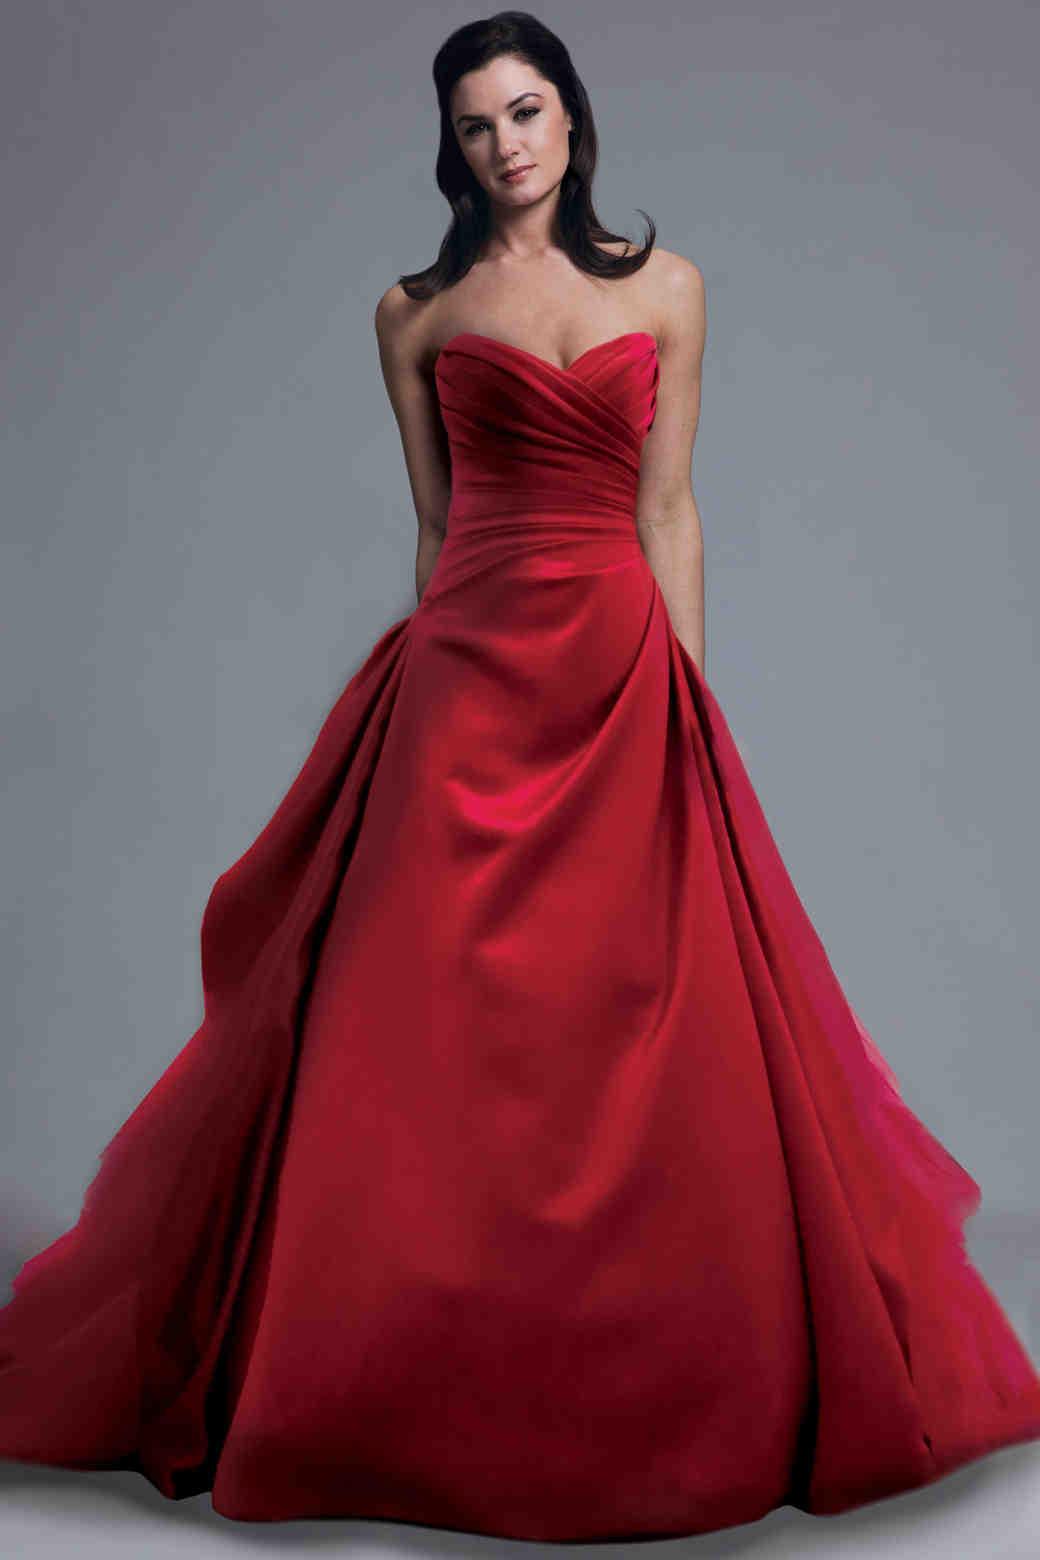 Red Wedding Dresses Spring 2013 Bridal Fashion Week